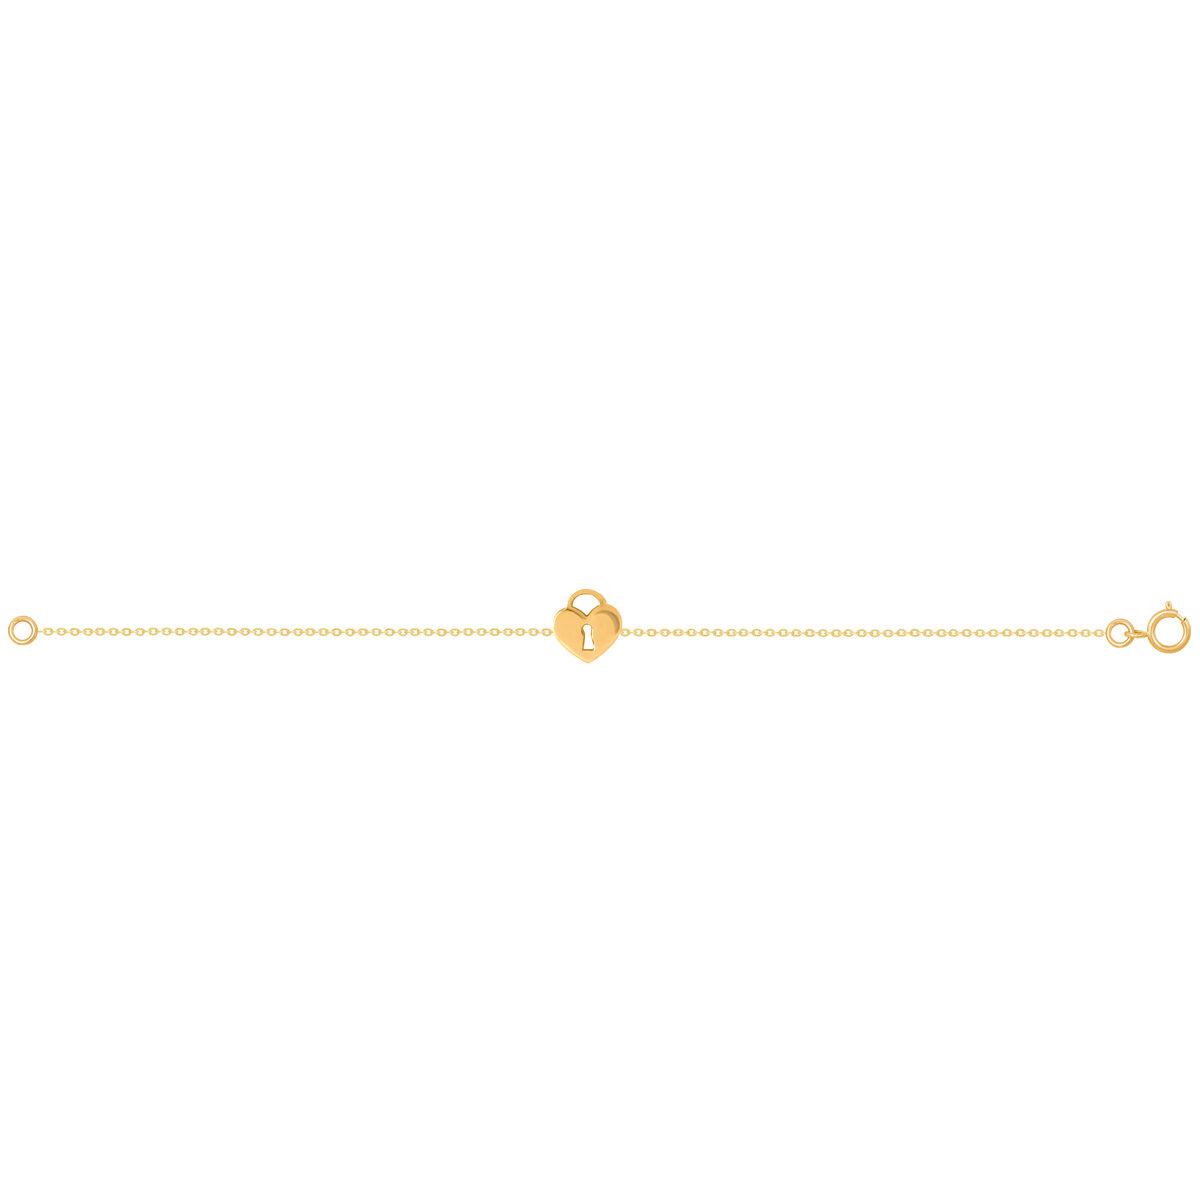 دستبند طلا قفل قلب پرسته